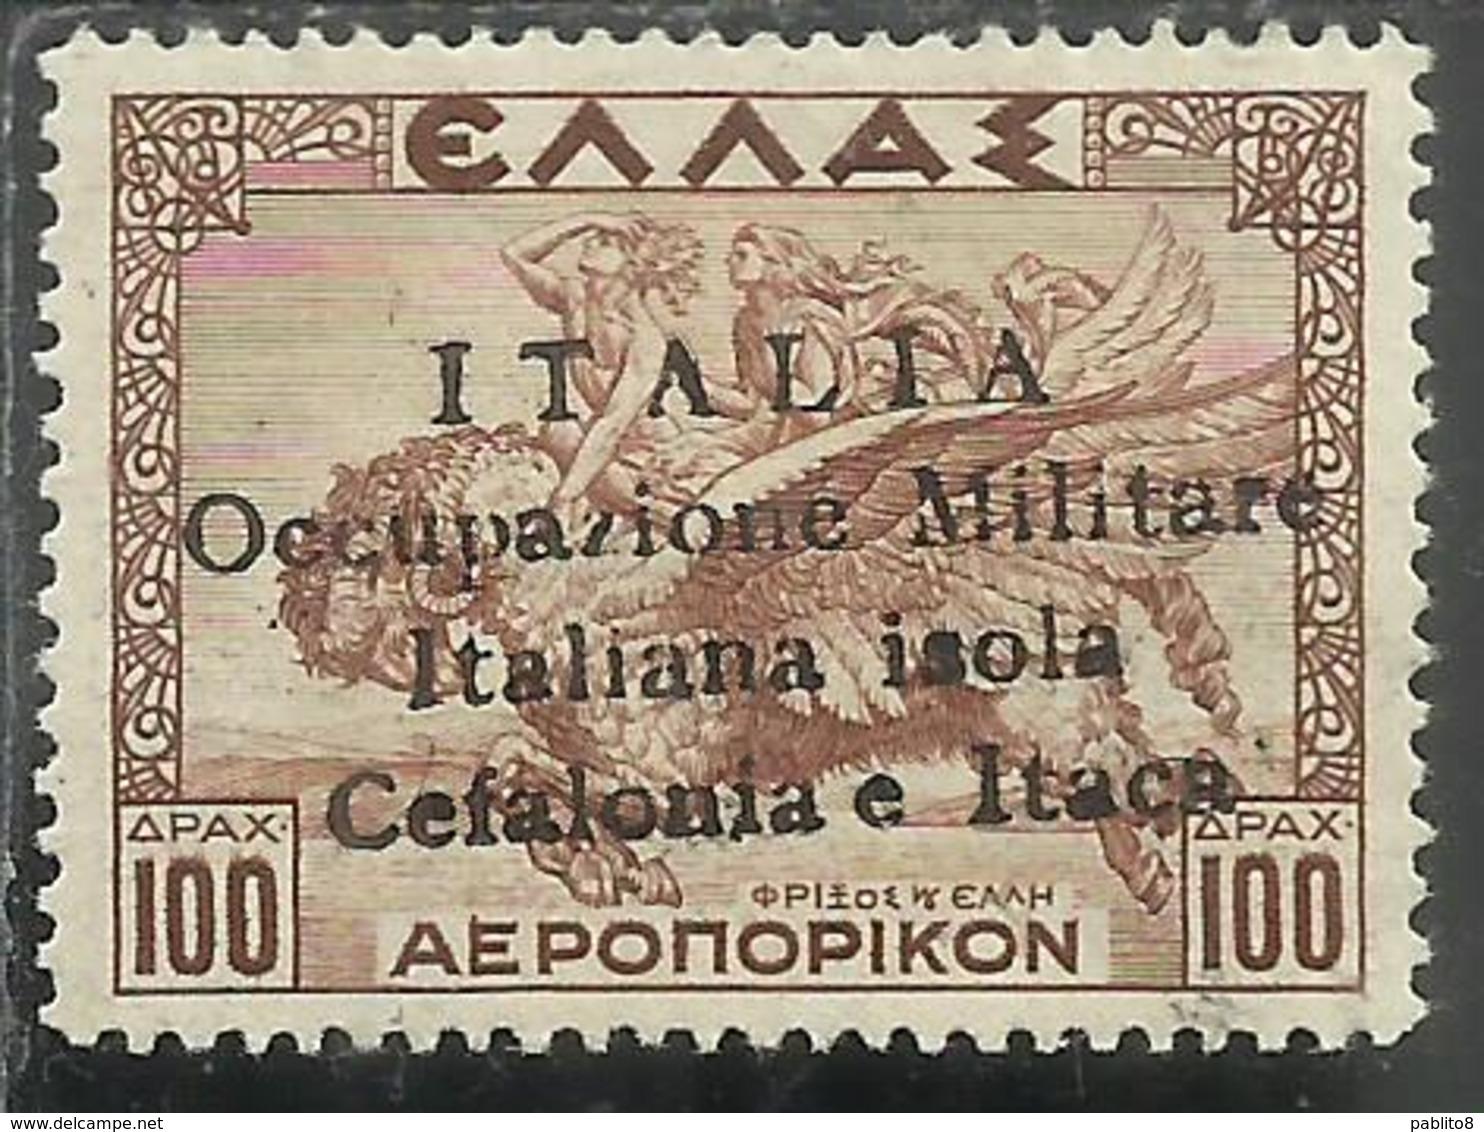 CEFALONIA E ITACA 1941 MITOLOGICA DRACME 100D MNH FIRMATO SIGNED - Cefalonia & Itaca